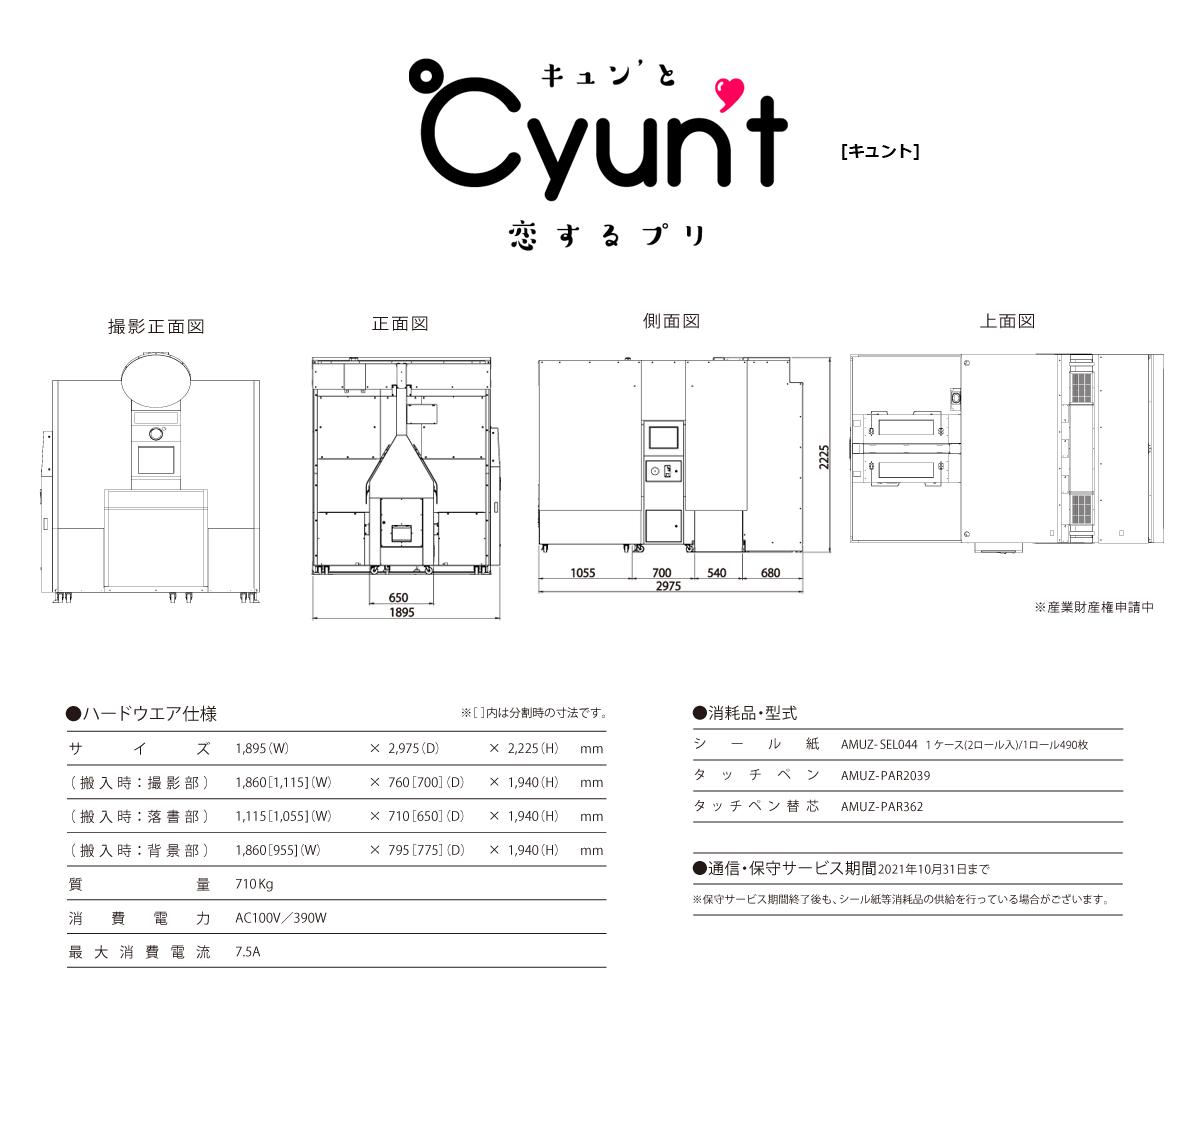 『Cyunt』仕様